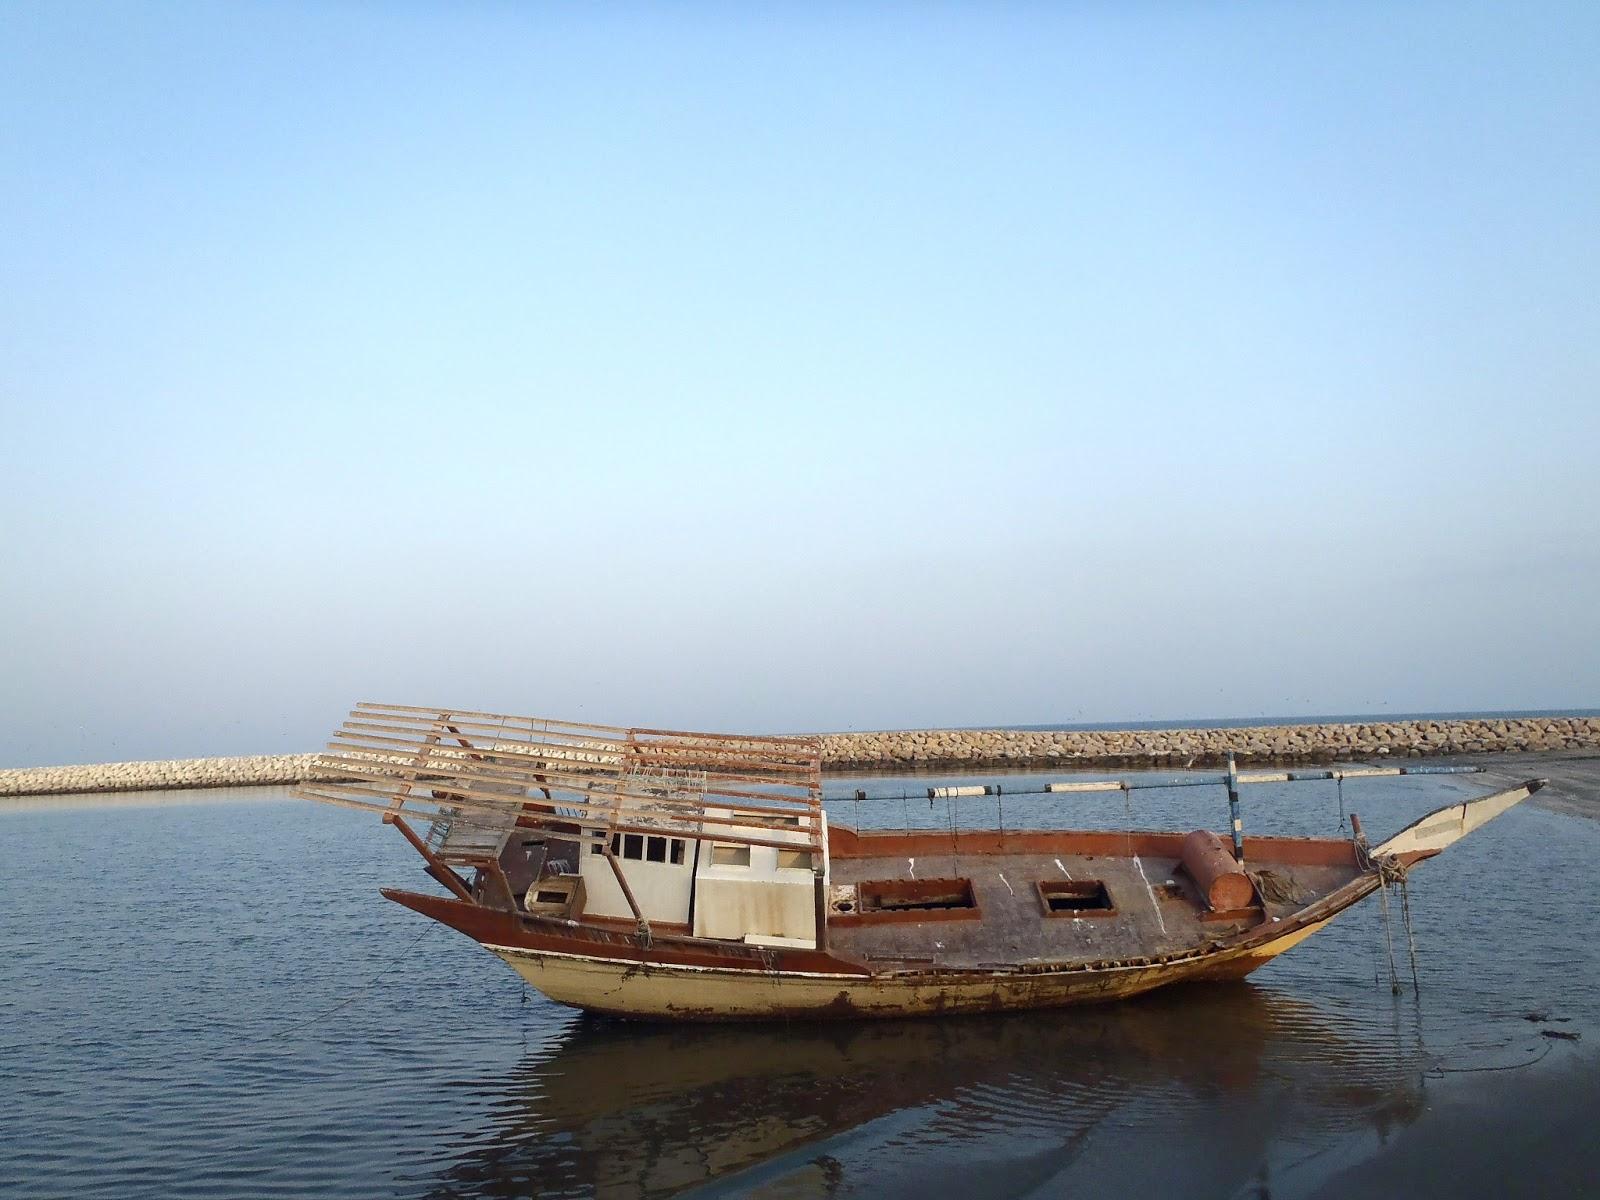 Sohar Oman  City new picture : The shoreline by The Cornish in Sohar, Oman